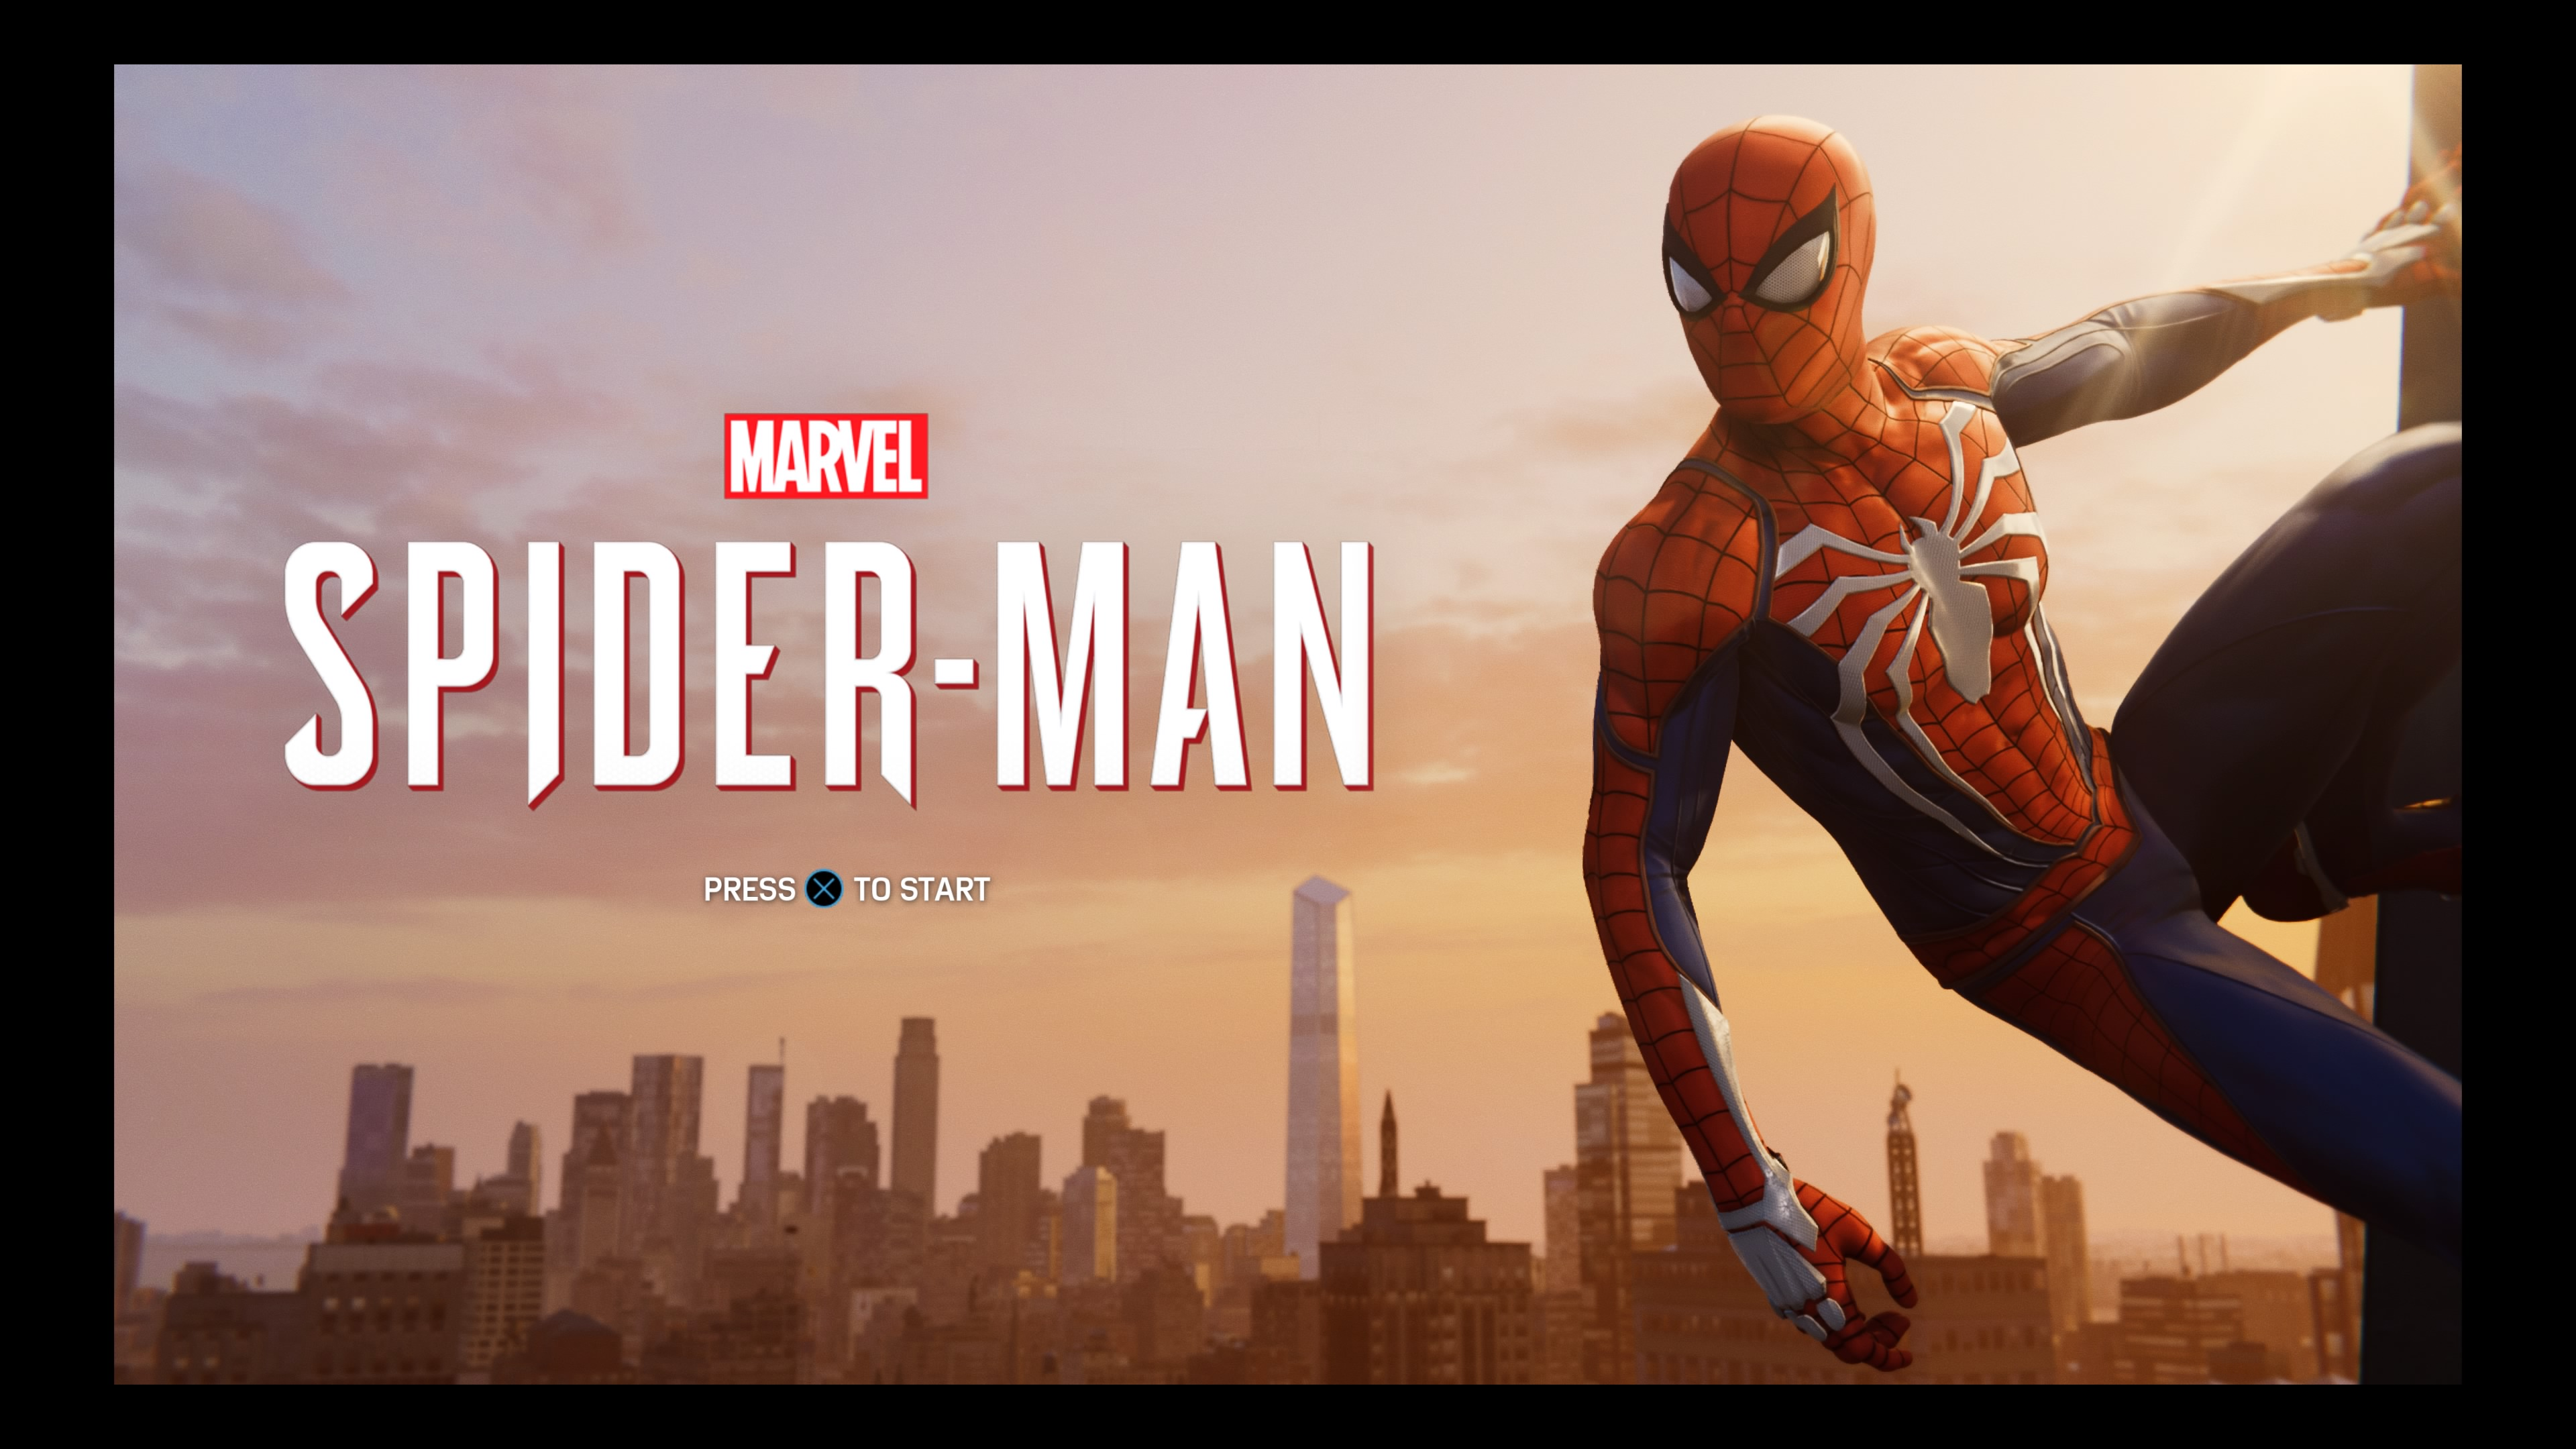 Marvel's Spider-Man - title screen